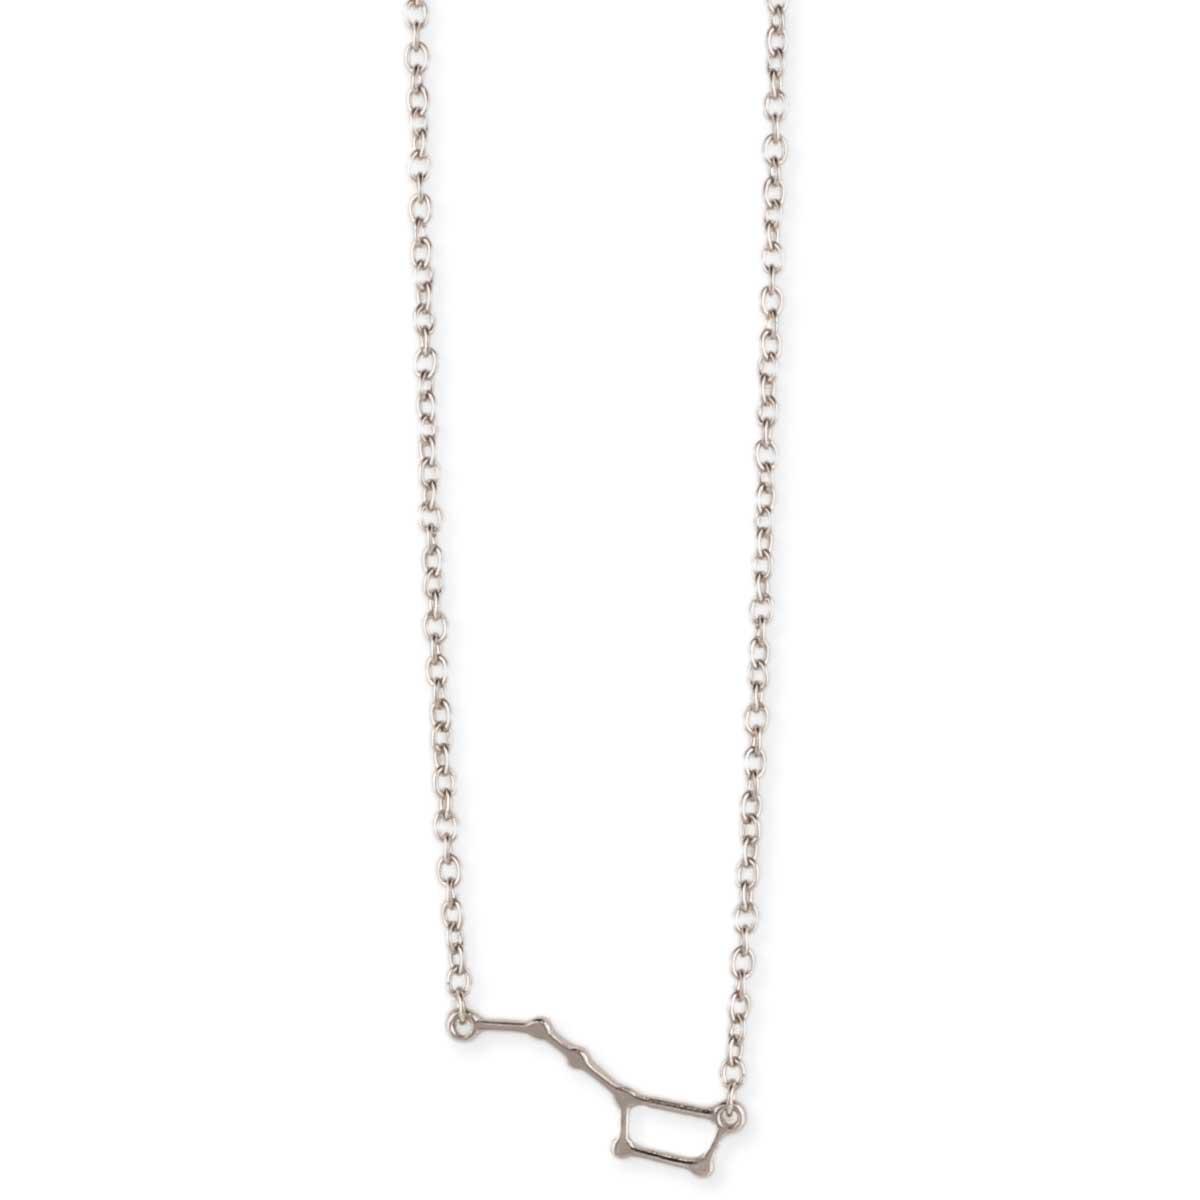 Silver Big Dipper Necklace